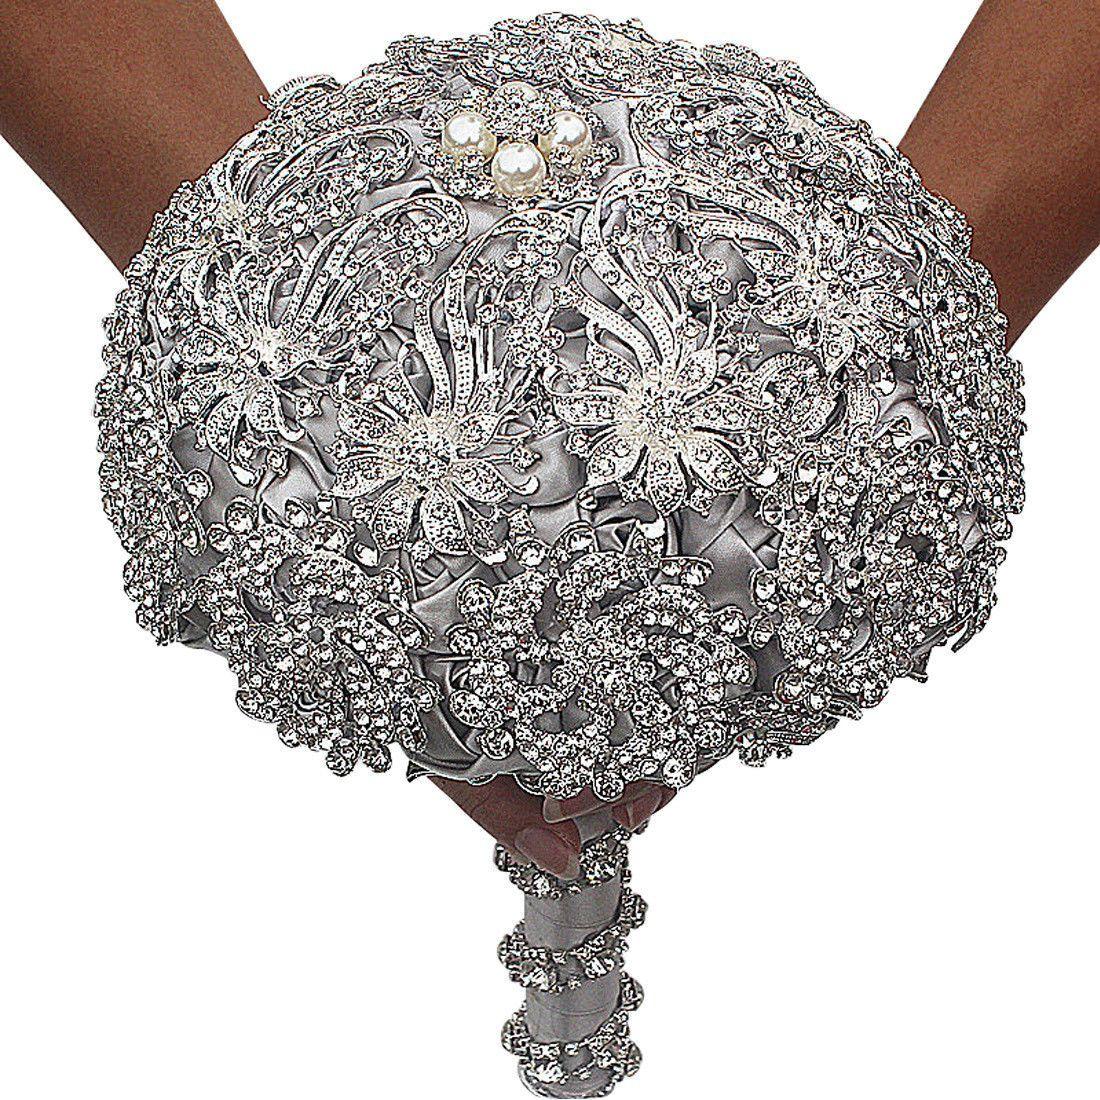 https://www.dhresource.com/0x0s/f2-albu-g7-M01-09-C8-rBVaSlta3XCAQXUxAAa-F1OoDR8355.jpg/luxury-crystal-pearls-bridal-wedding-silver-flower-bouquet-brooch-bride-hand-flowers-wedding-favors-hand-holding-decoration-handmade.jpg